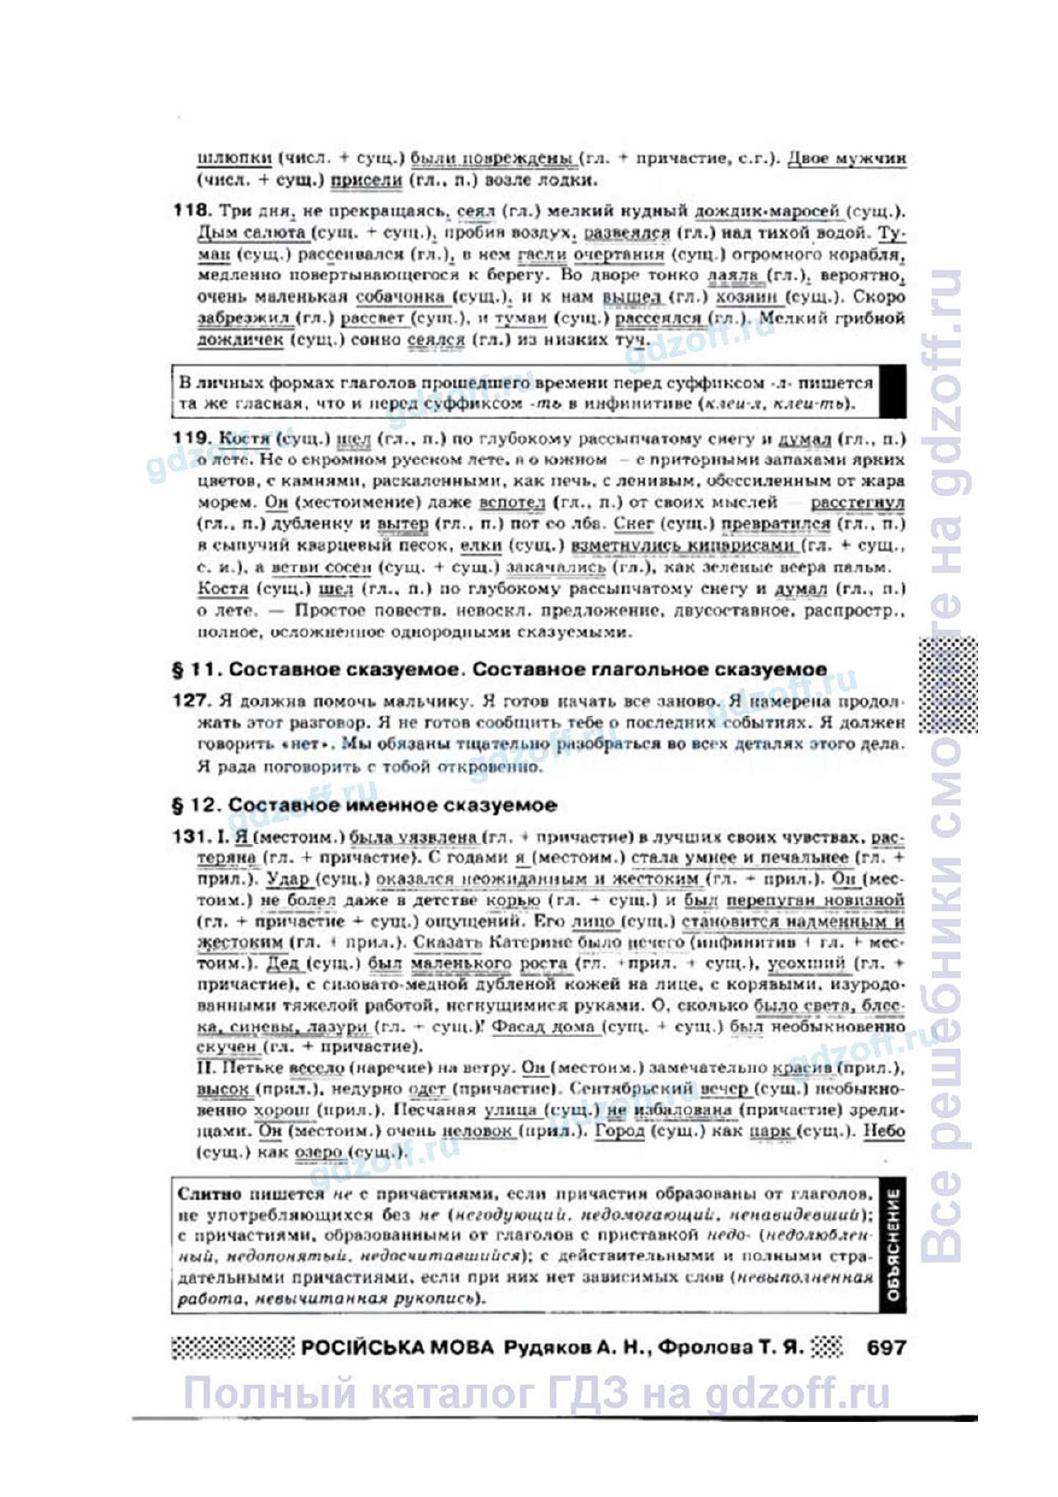 Русский язык 10 класс а.н рудяков т.я фролова е.и.быкова гдз